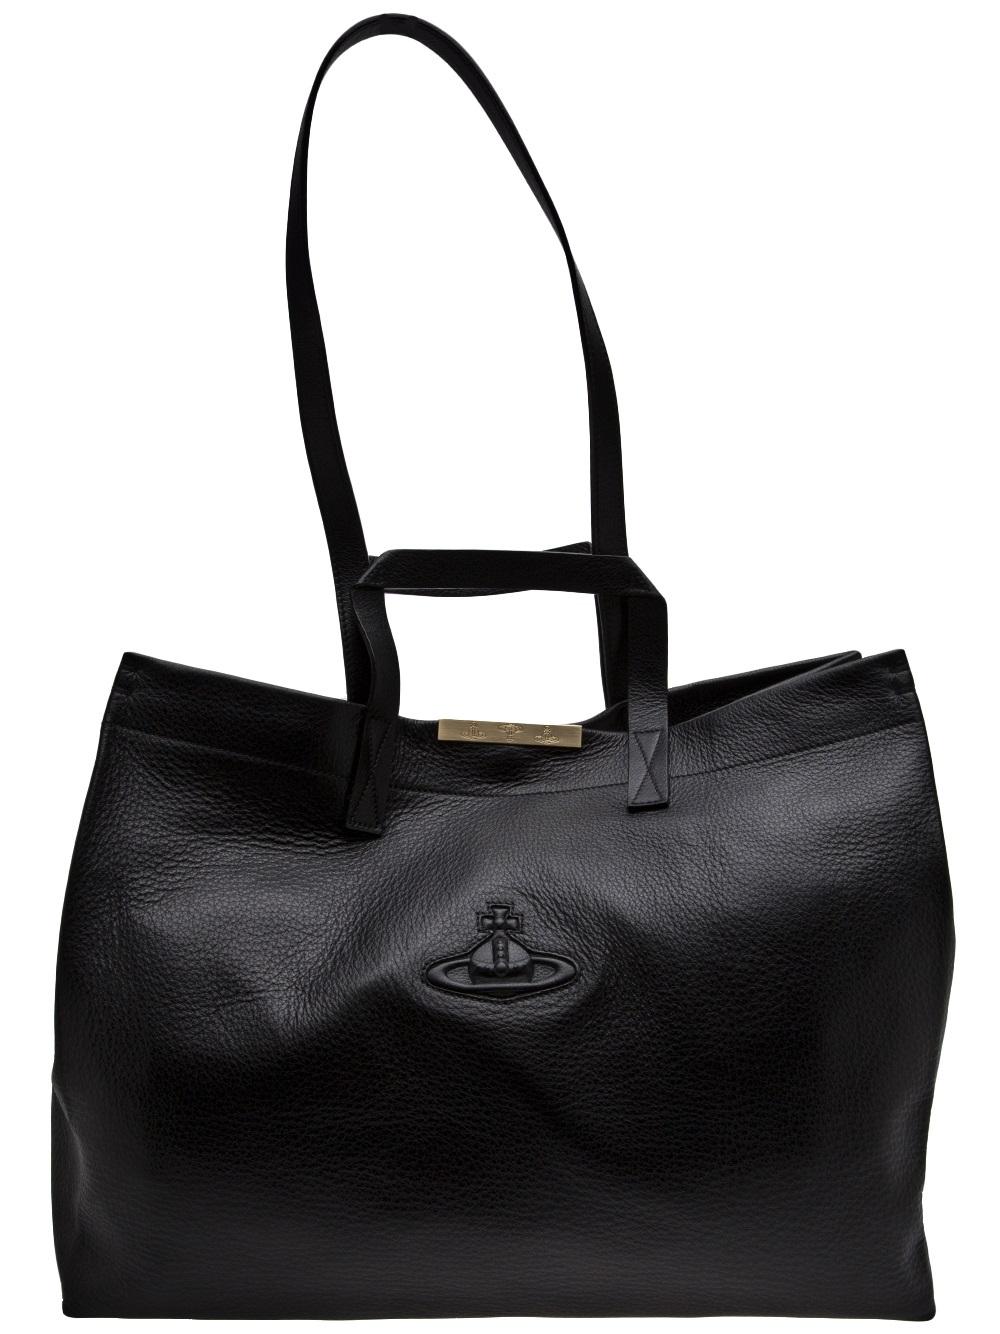 b95de49aa3 Lyst - Vivienne Westwood Large Shopper Bag in Black